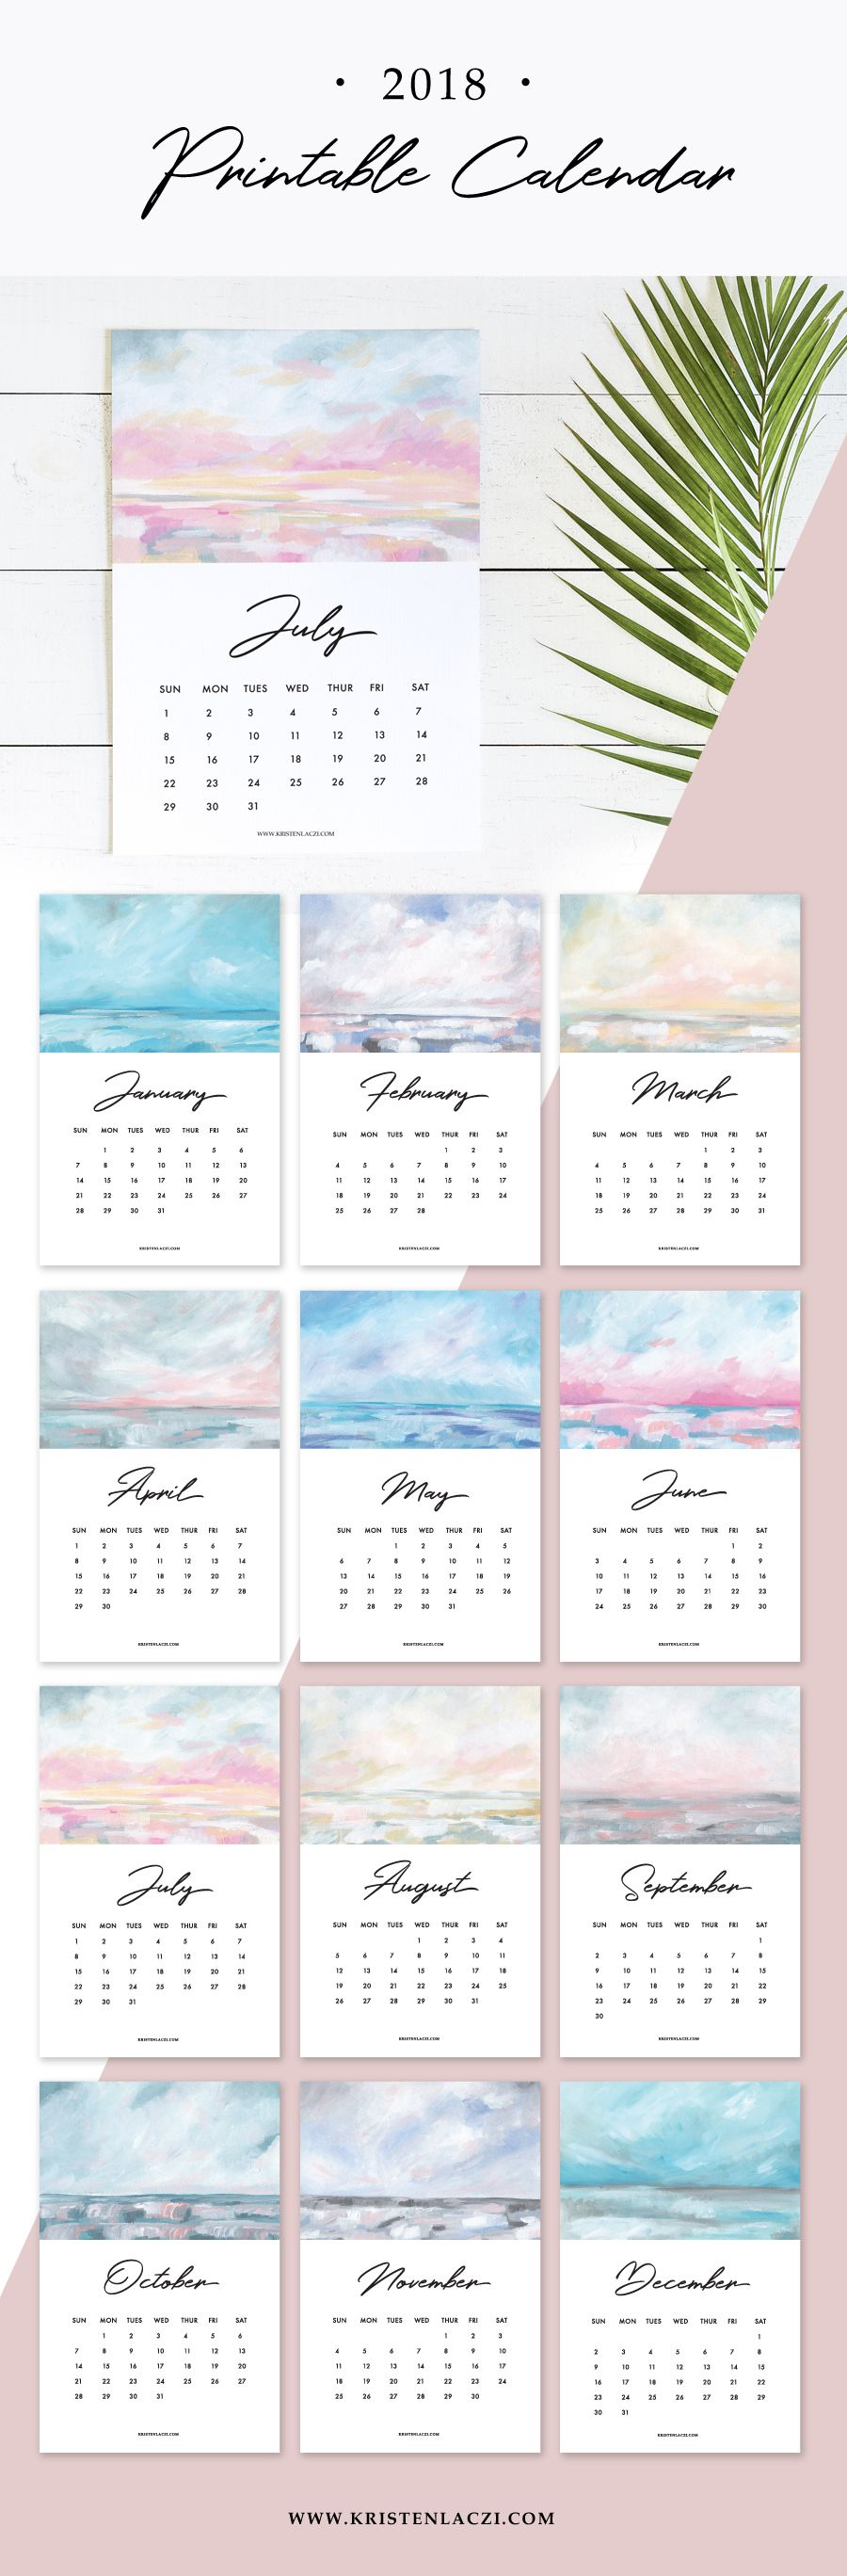 Printable Calendar  Printable Calender Planners And Bullet